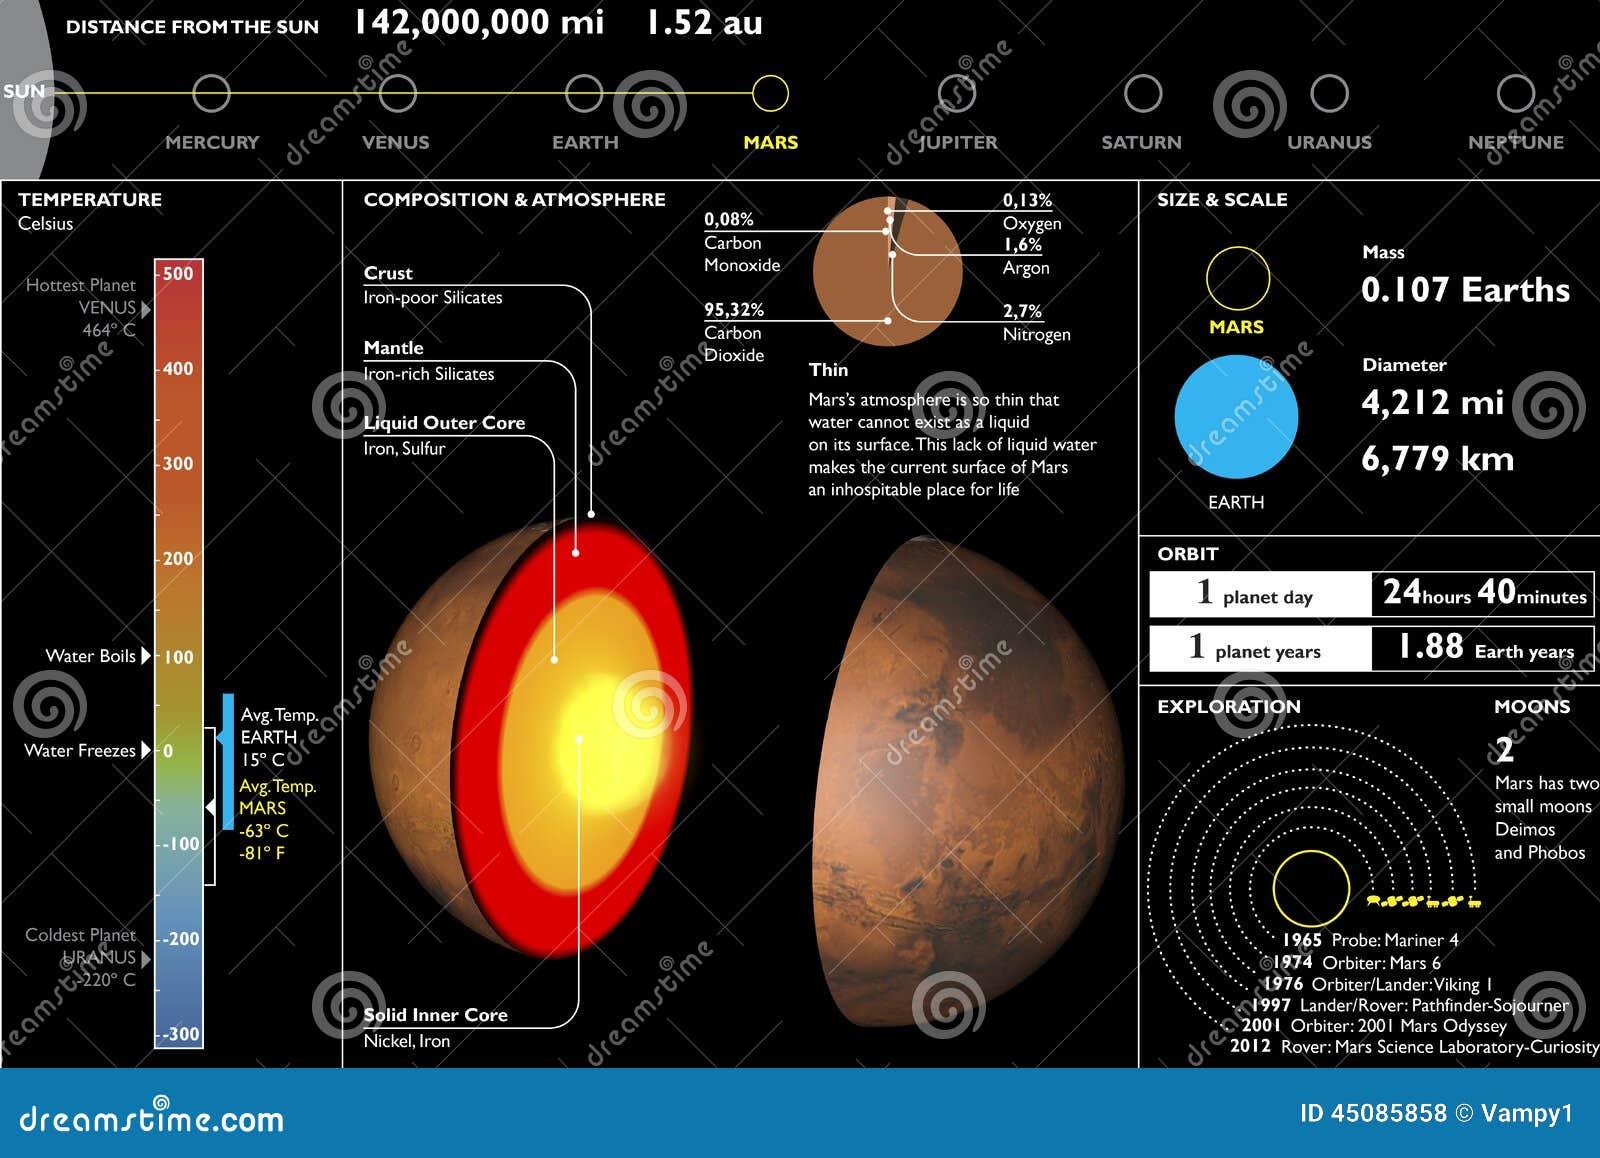 Mars, Planet, technisches Leistungsblatt, Abschnittausschnitt